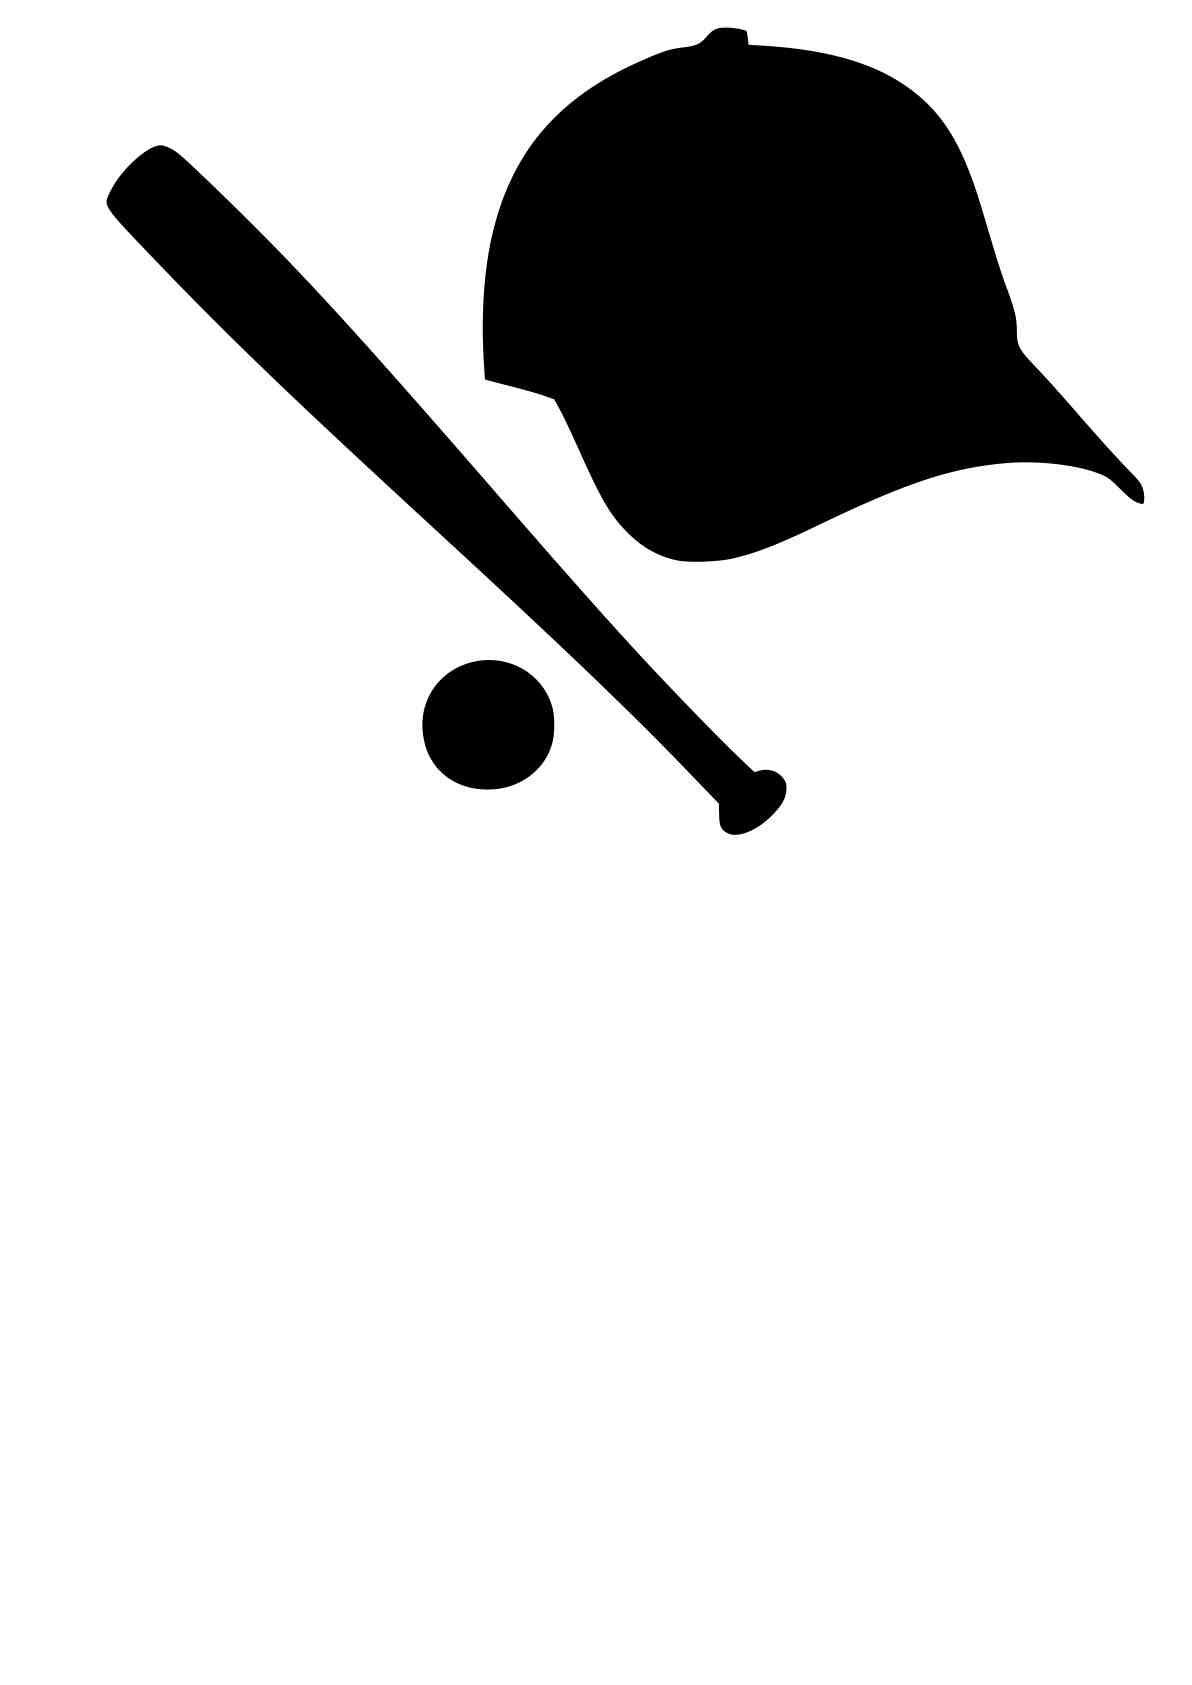 Free Svg Download Baseball Hat Ball Amp Bat Beaoriginal